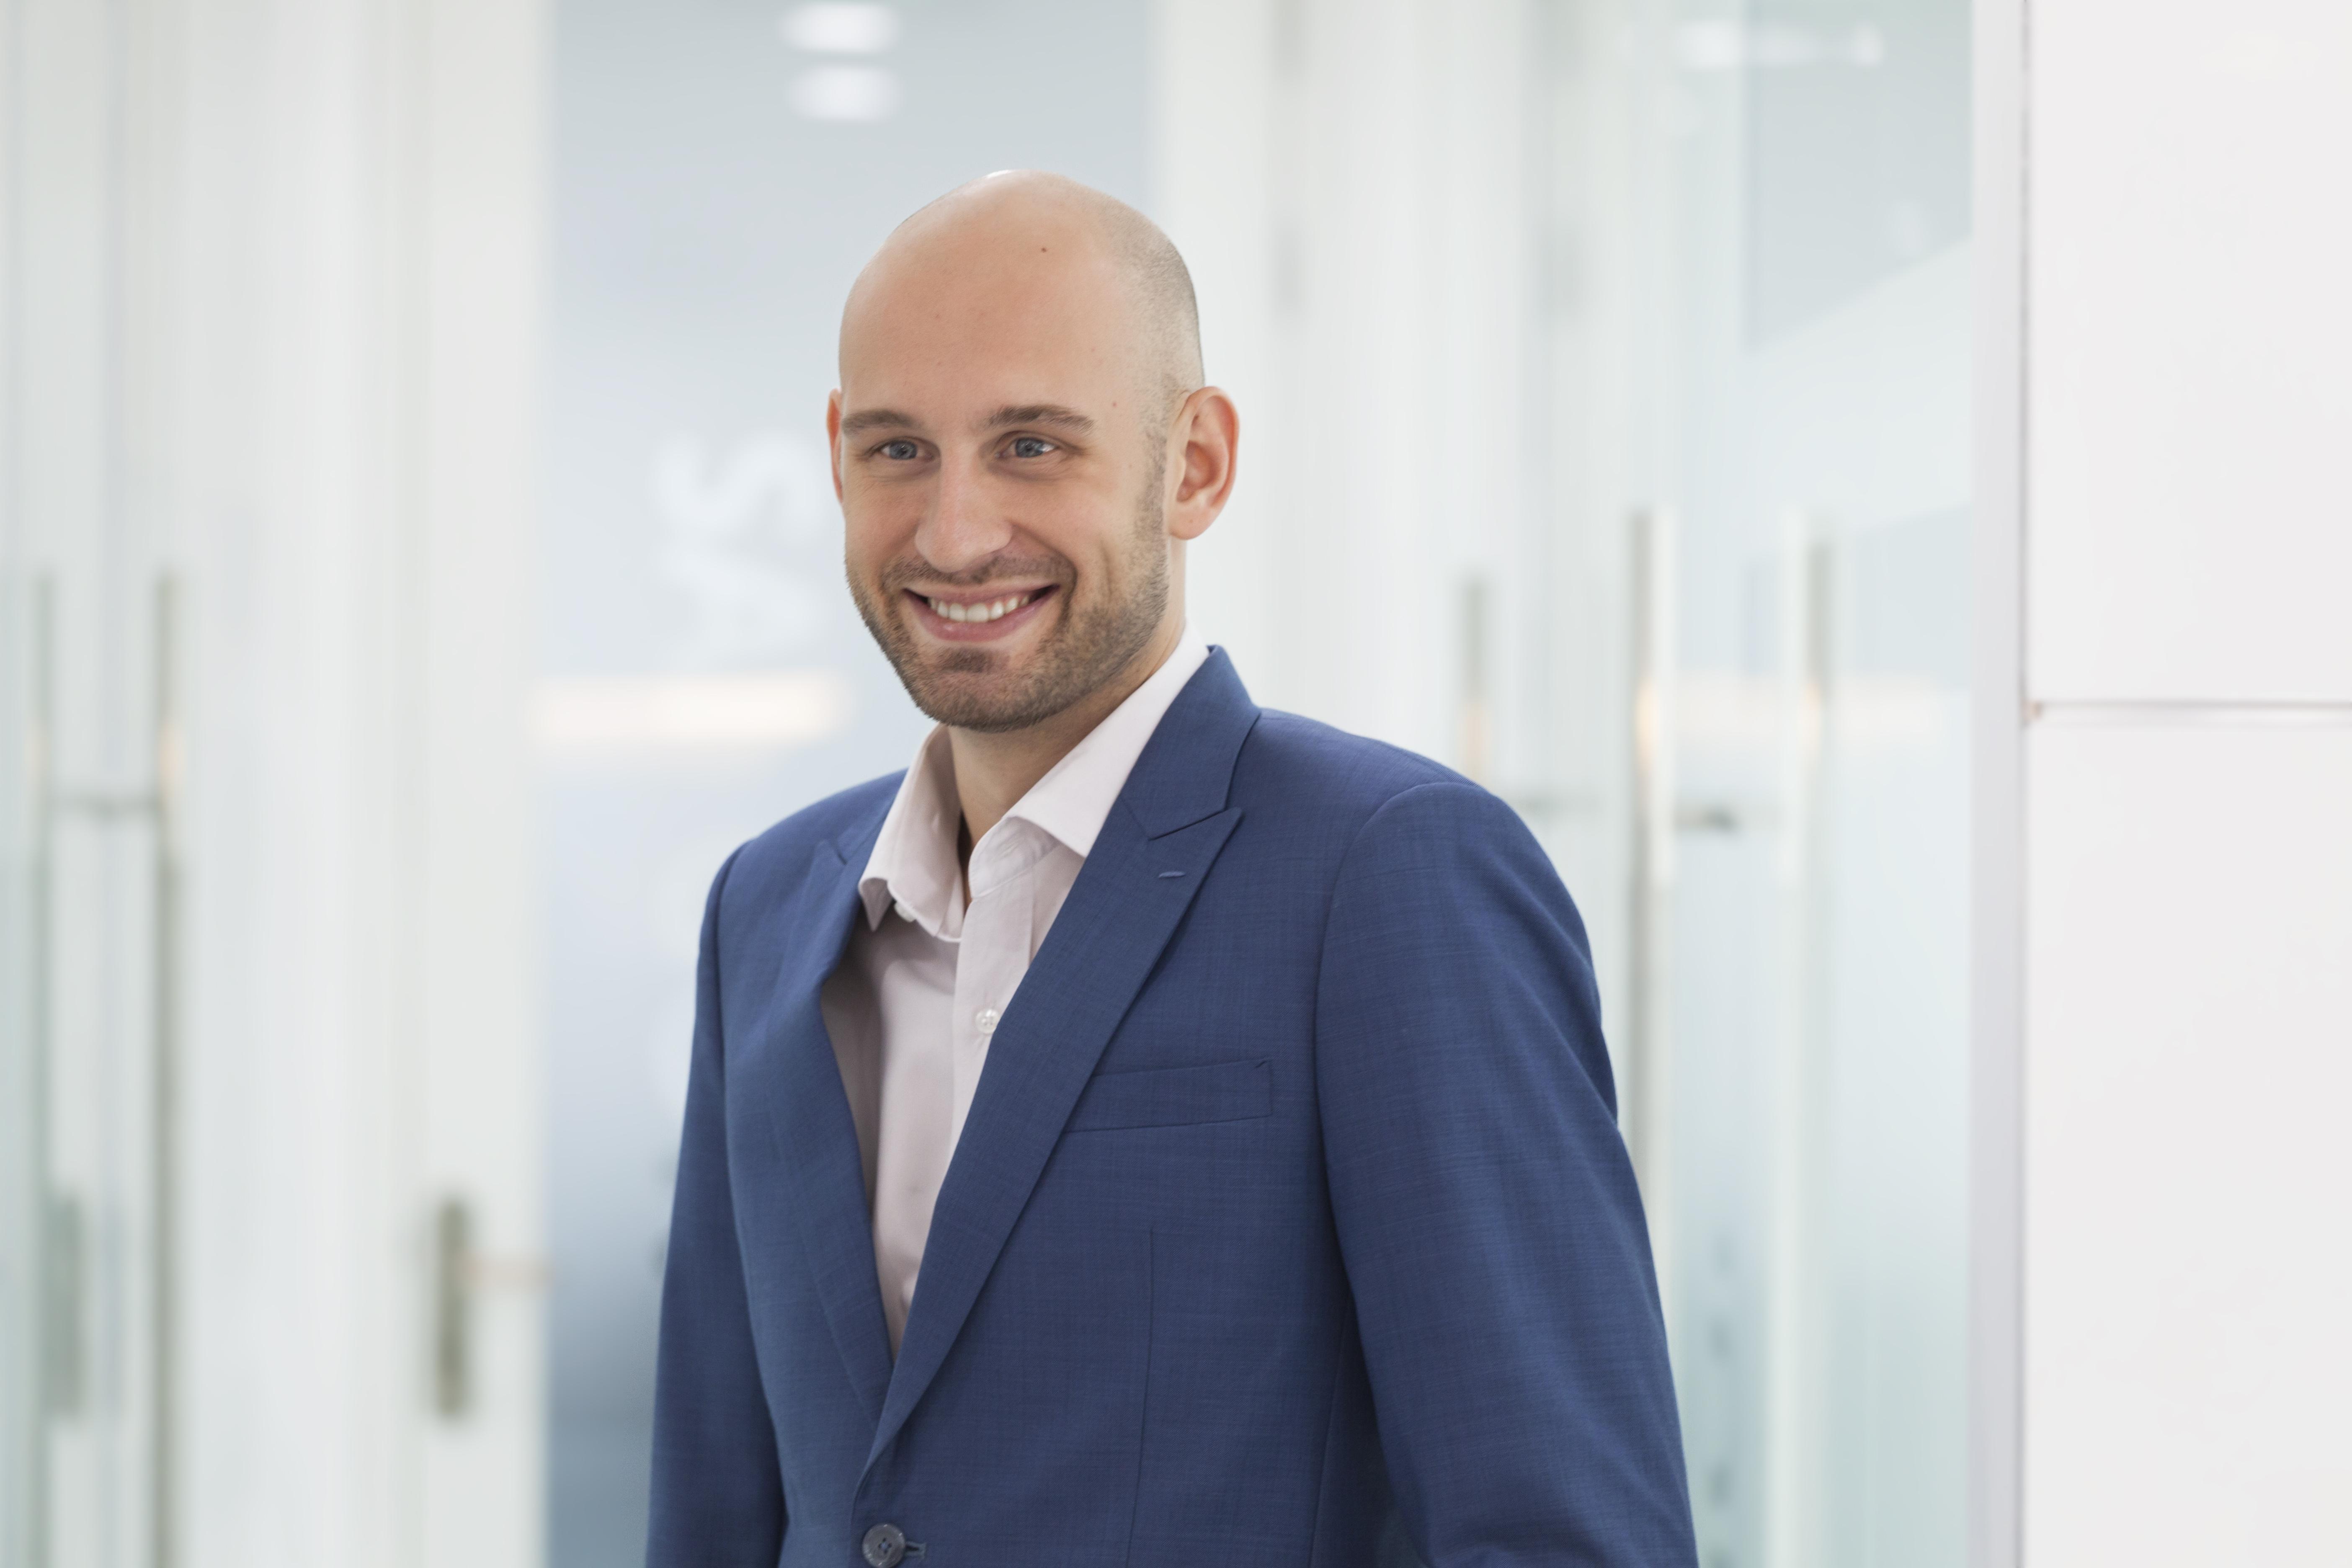 Andrew Humphreys, Associate Director of Supply Chain & Engineering, Sales & Marketing Industrial of Robert Walters